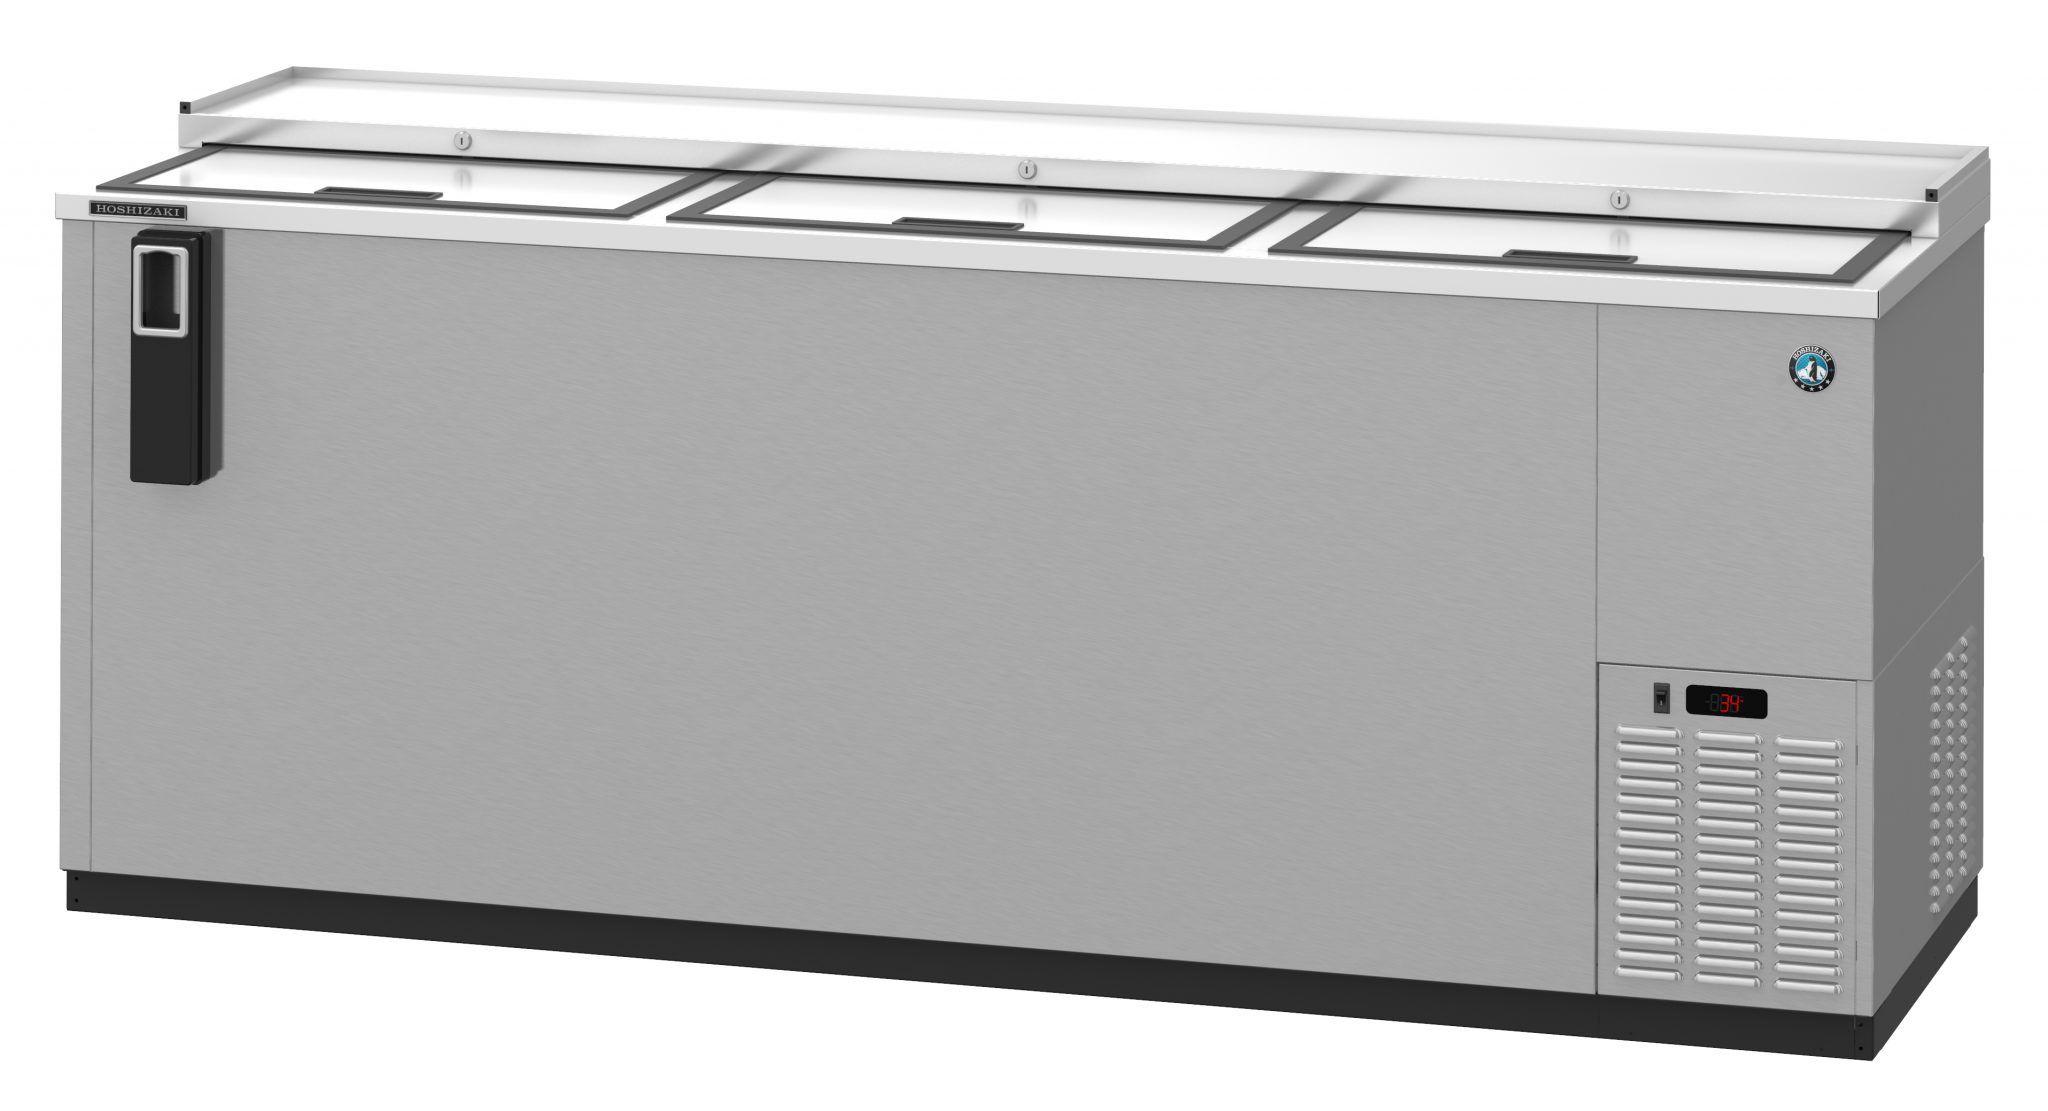 Hbc 80 S Refrigerator Three Section Stainless Steel Back Bar Bottle Cooler Slide Top Doors Bottle Coolers Back Bar Bottle